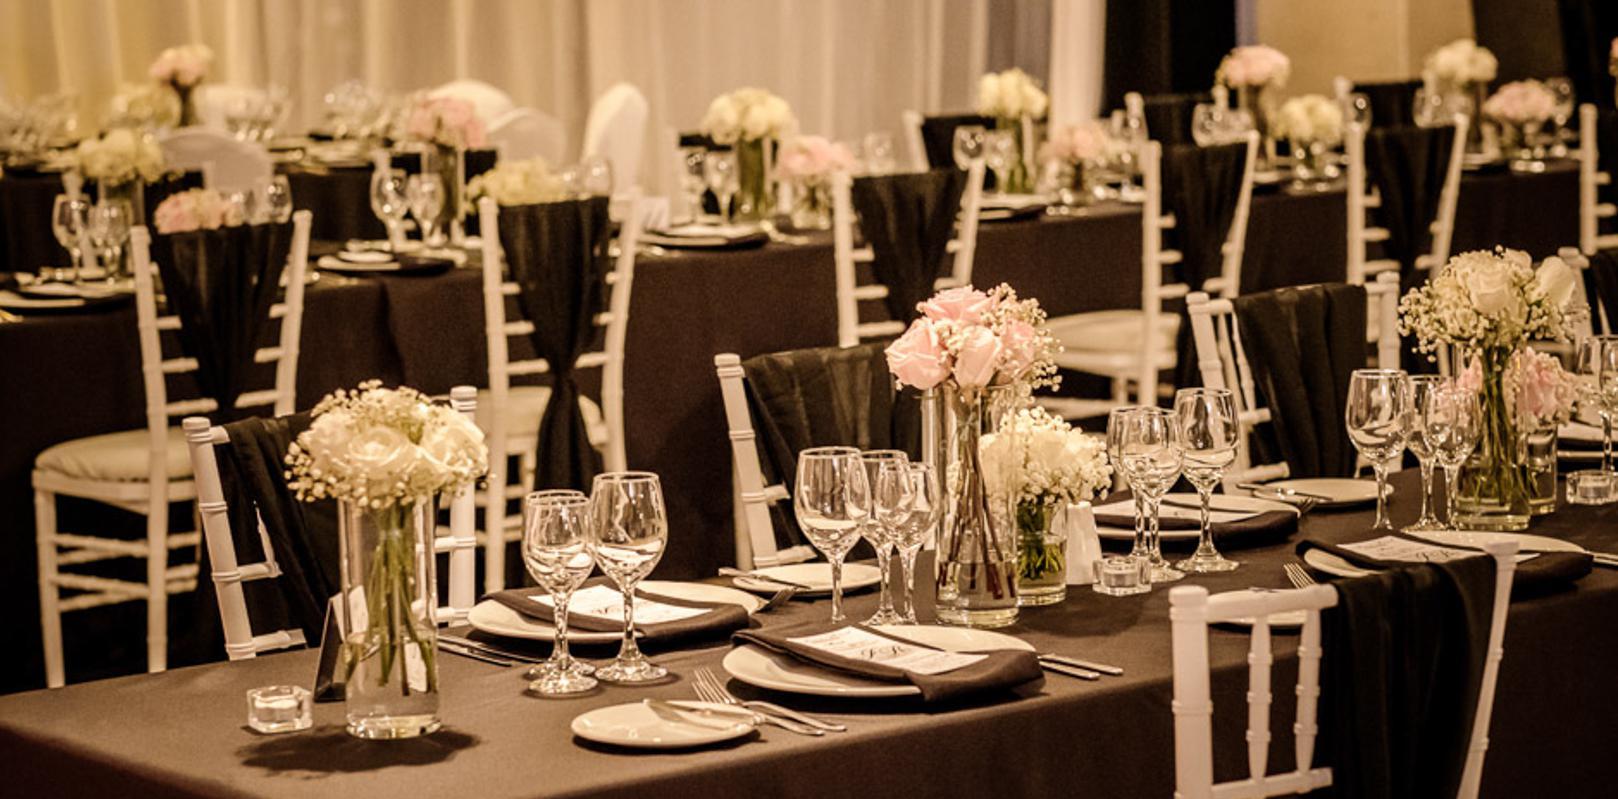 bodas-sin-clasificar-sin-tema-cuba-41242.jpg